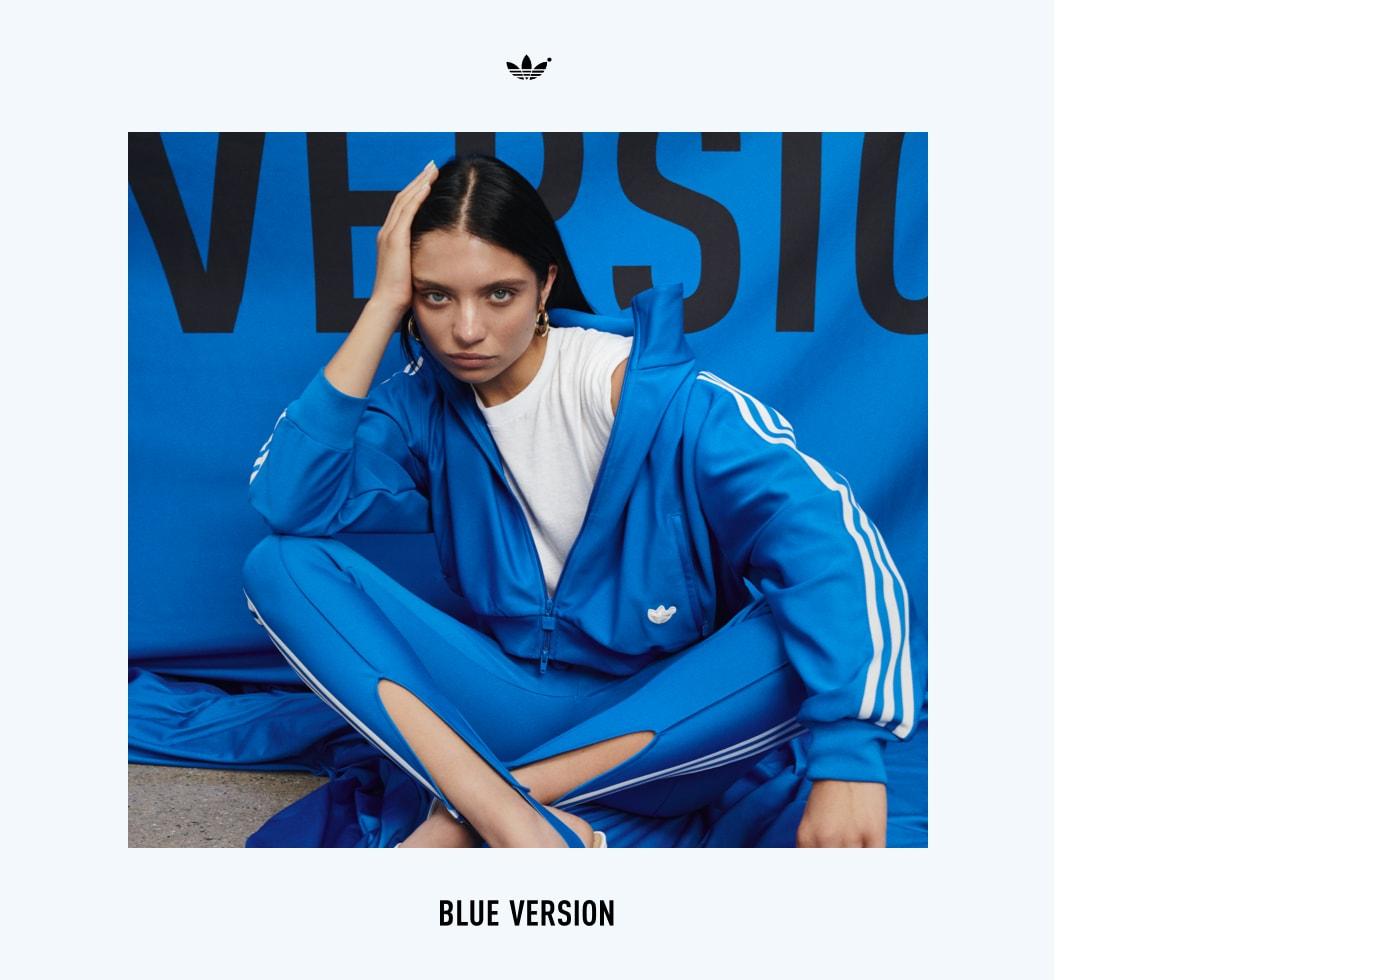 An image of Ganna Bogdan sitting cross-legged sporting the Blue Version Beckenbauer tracksuit in bluebird.